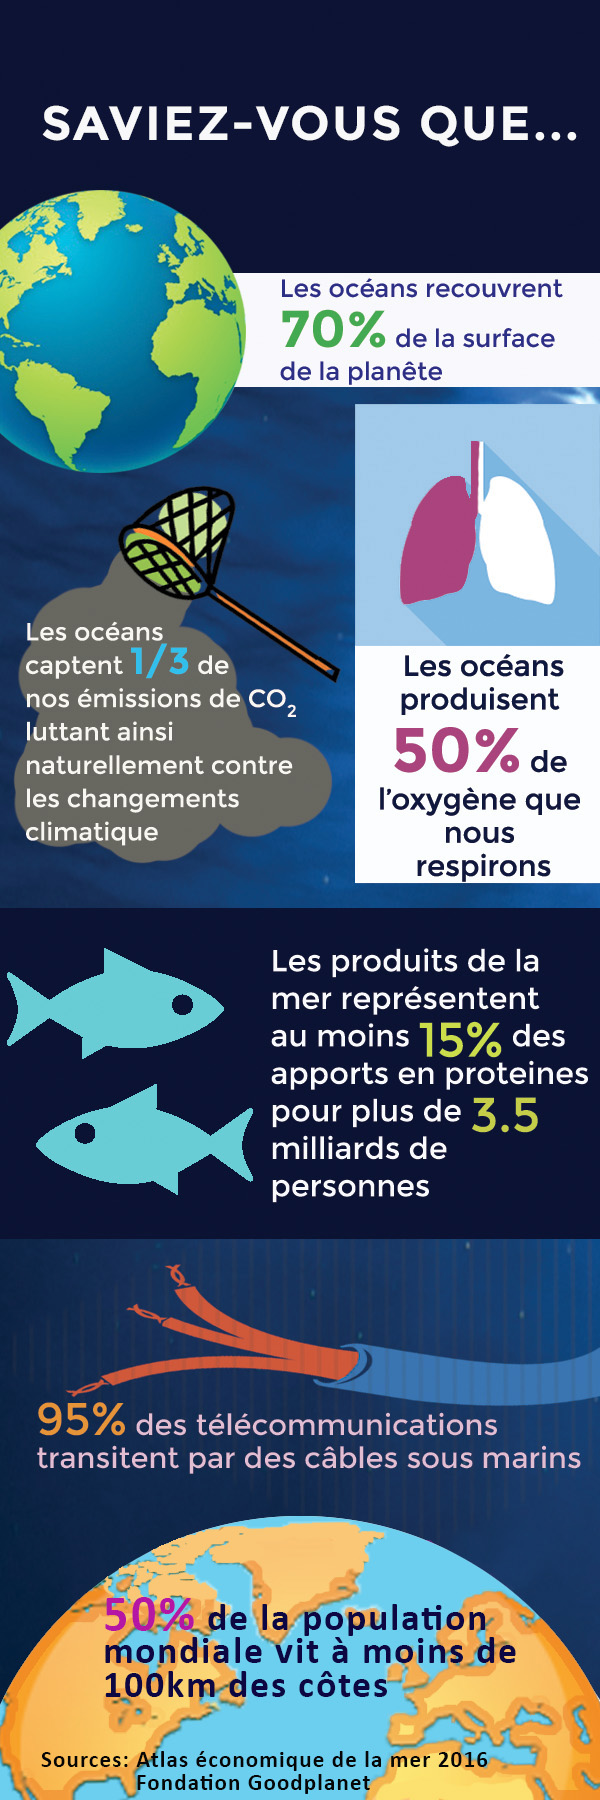 La mer en chiffres - infographie SAPMER